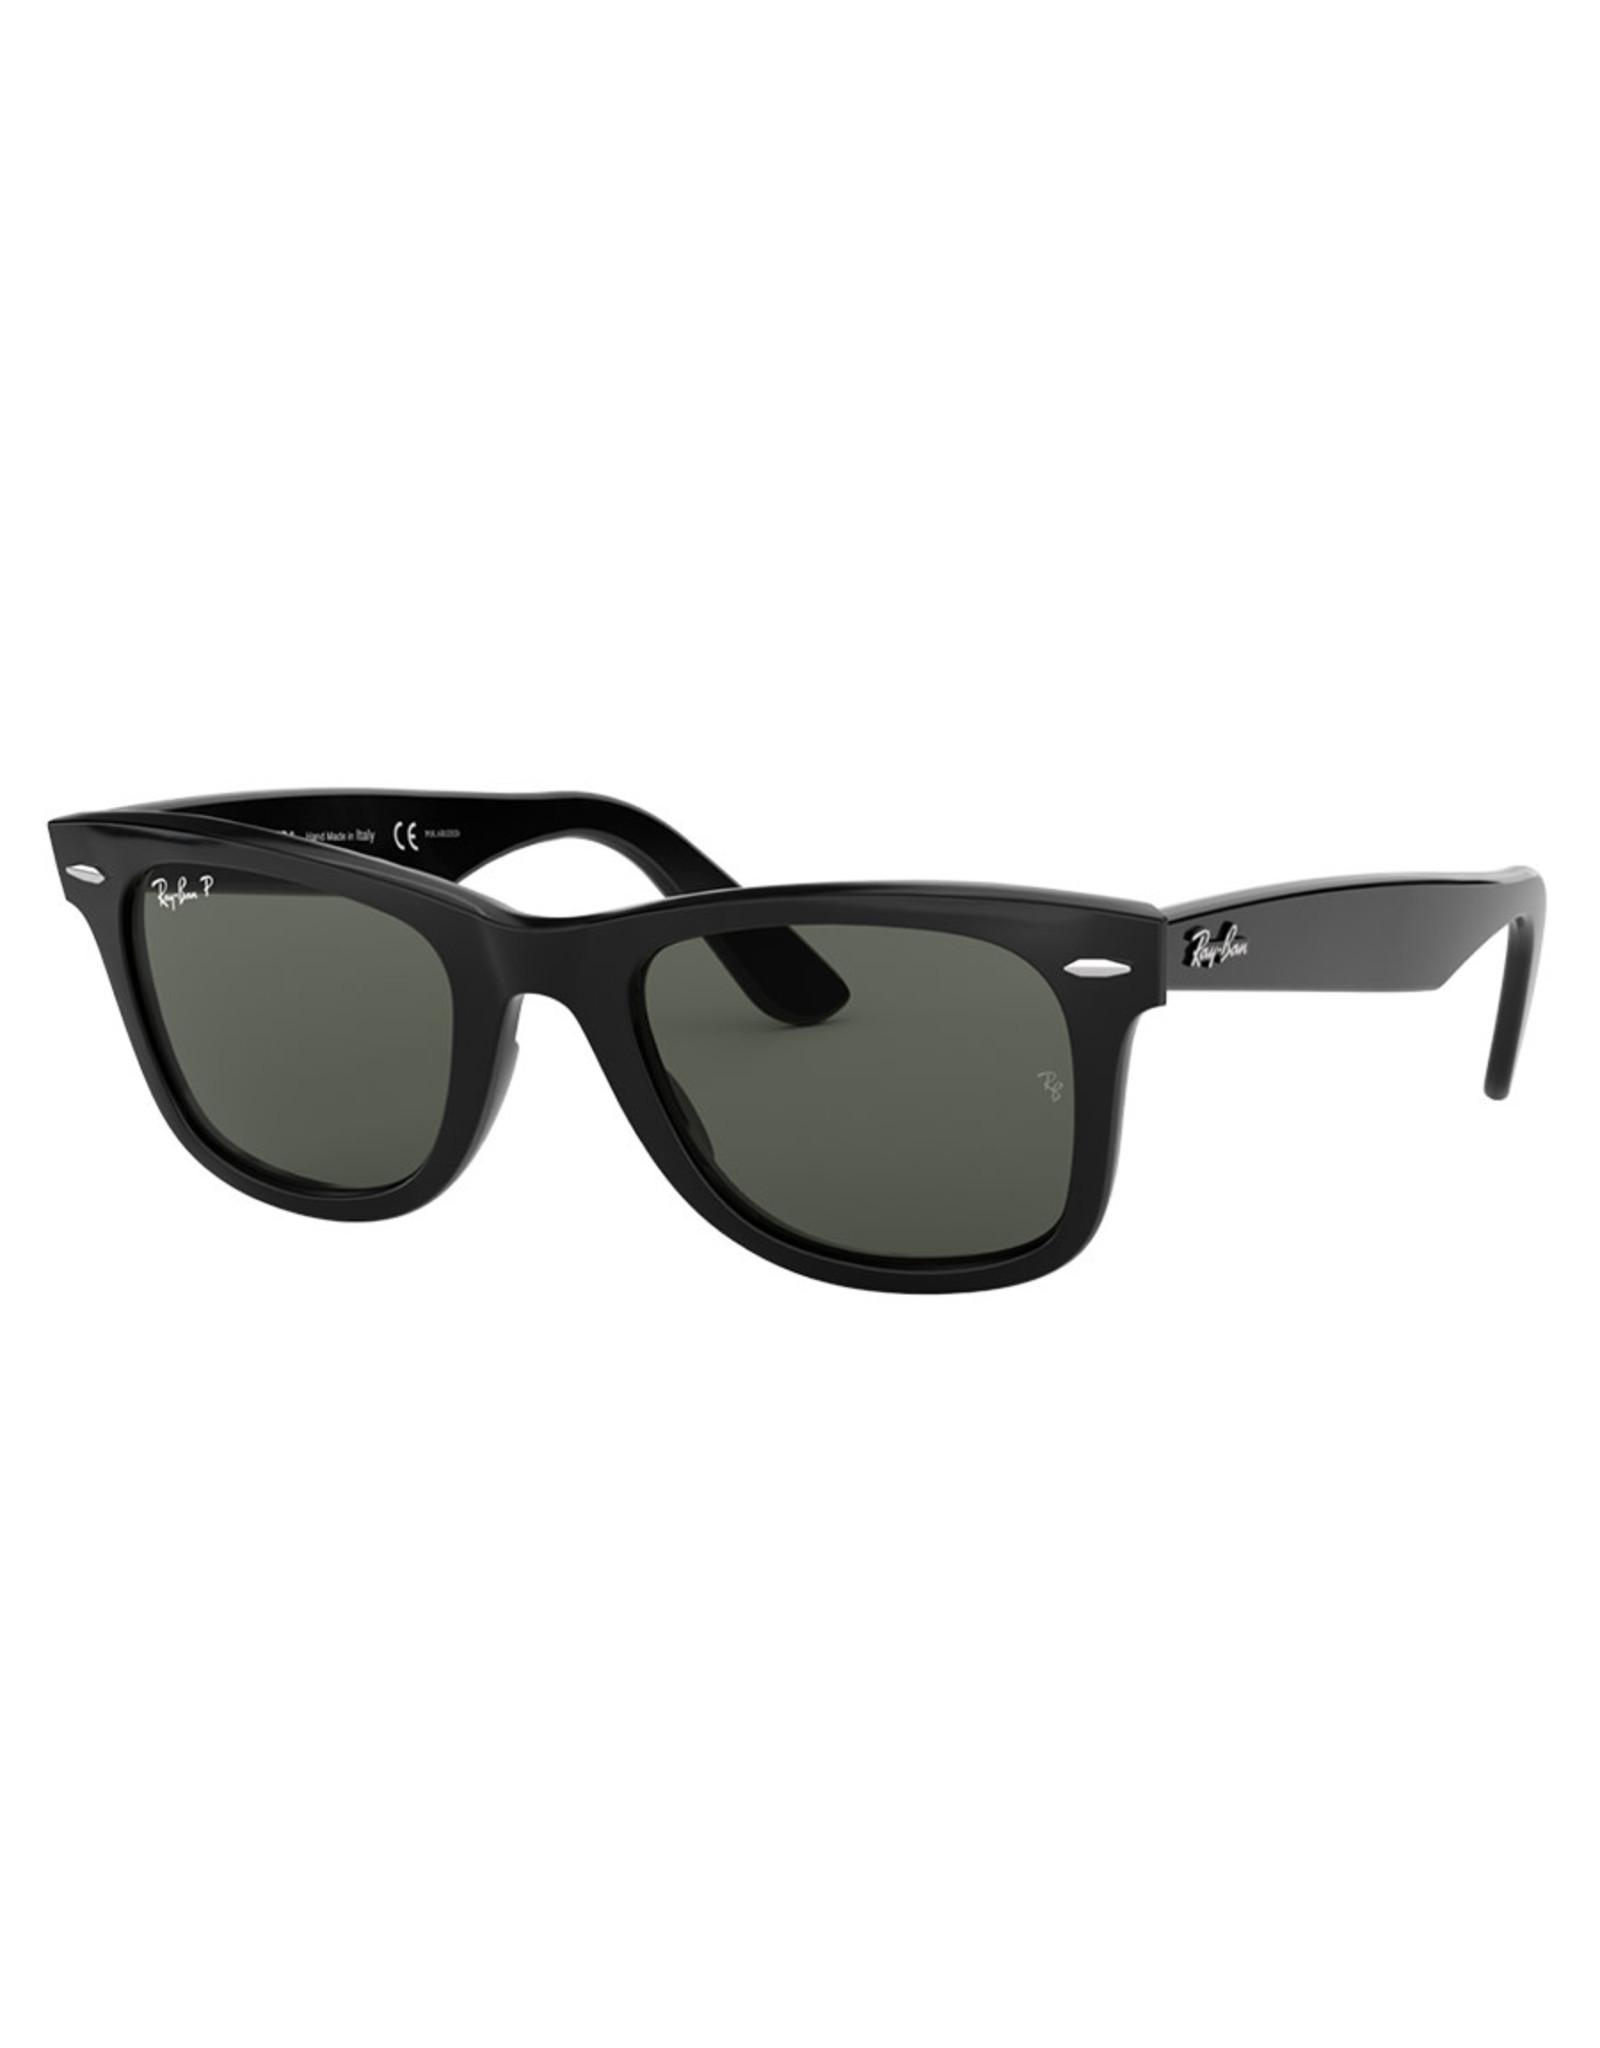 Ray Ban Ray Ban Sunglasses RB2140 Original Wayfarer (50F/Black Gloss/Polarized Green Lens)